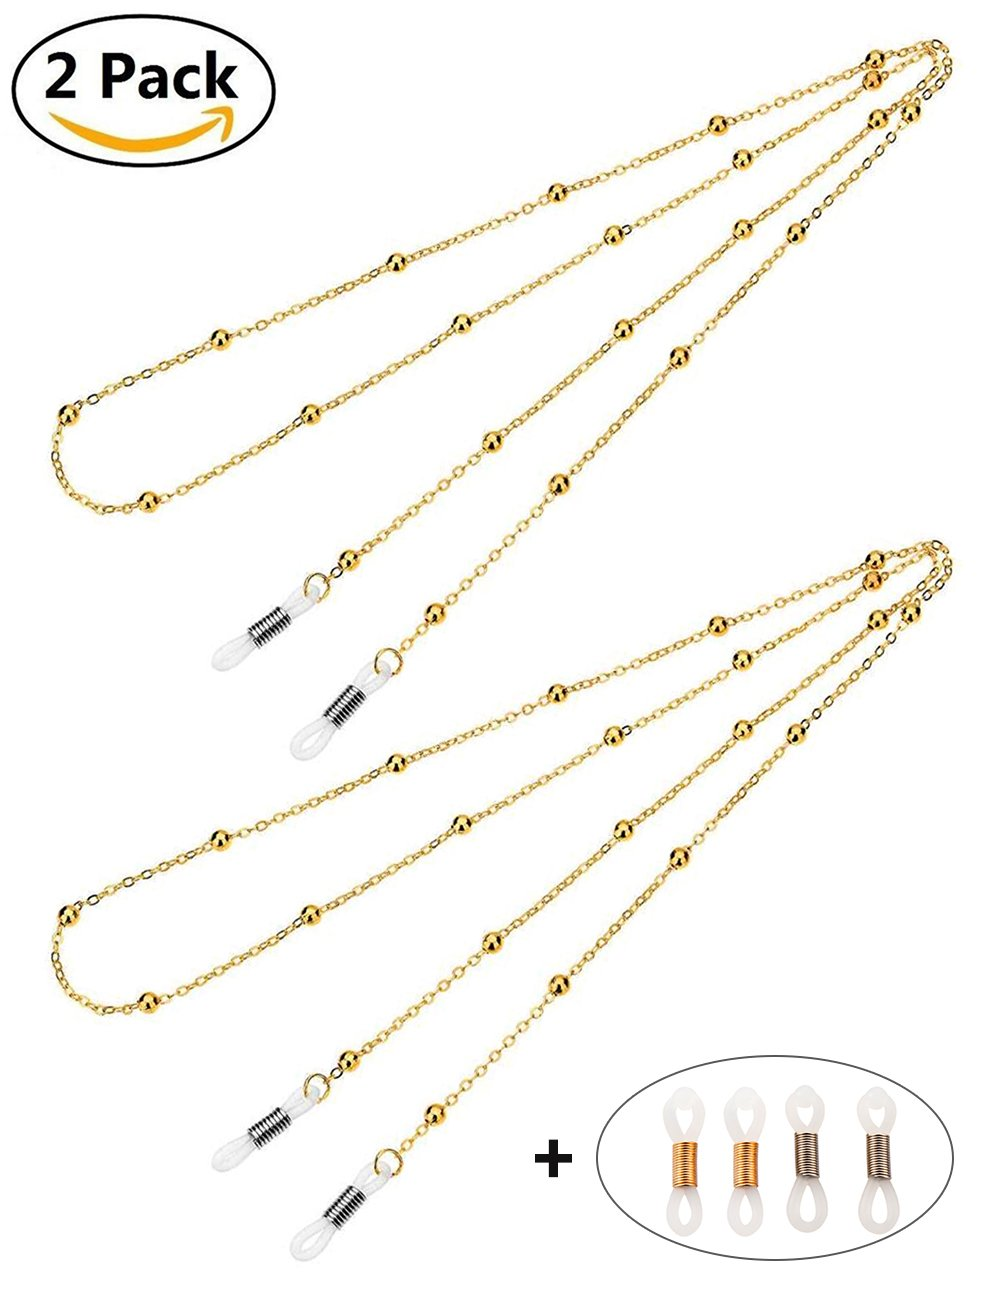 Mini Tree Eyeglass Chains for Women Beaded Reading Glasses Cords Sunglasses Holder Strap Lanyards Eyewear Retainer (Gold + Gold)